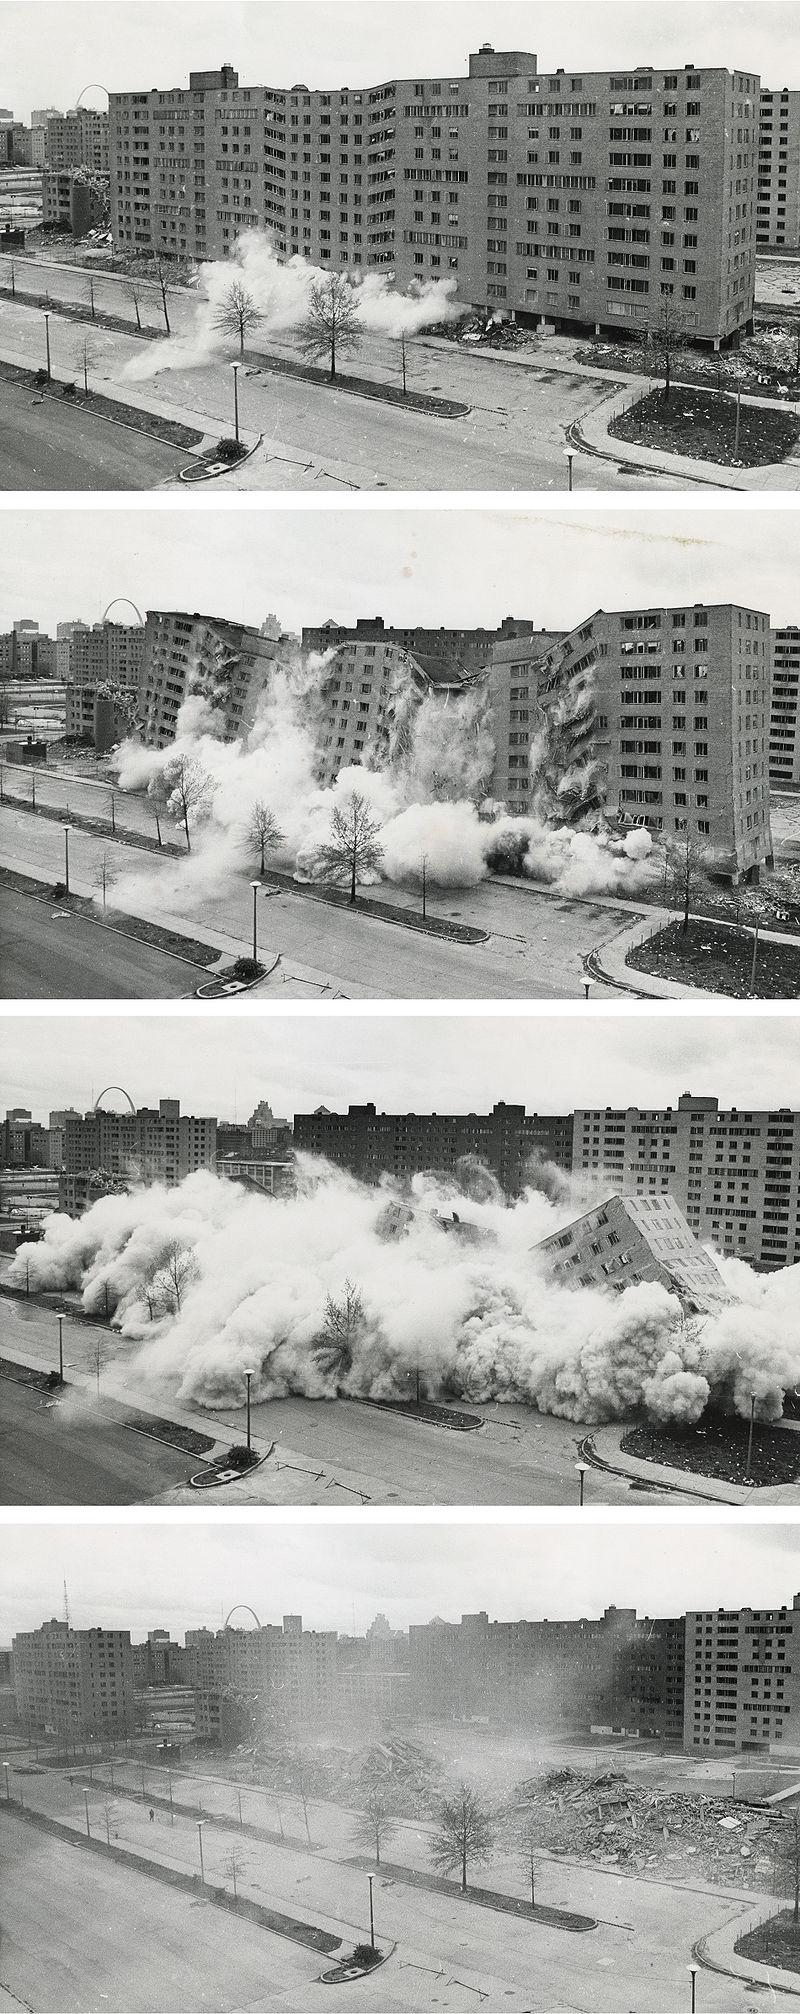 800px-Pruitt-igoe_collapse-series _ public domain.jpg